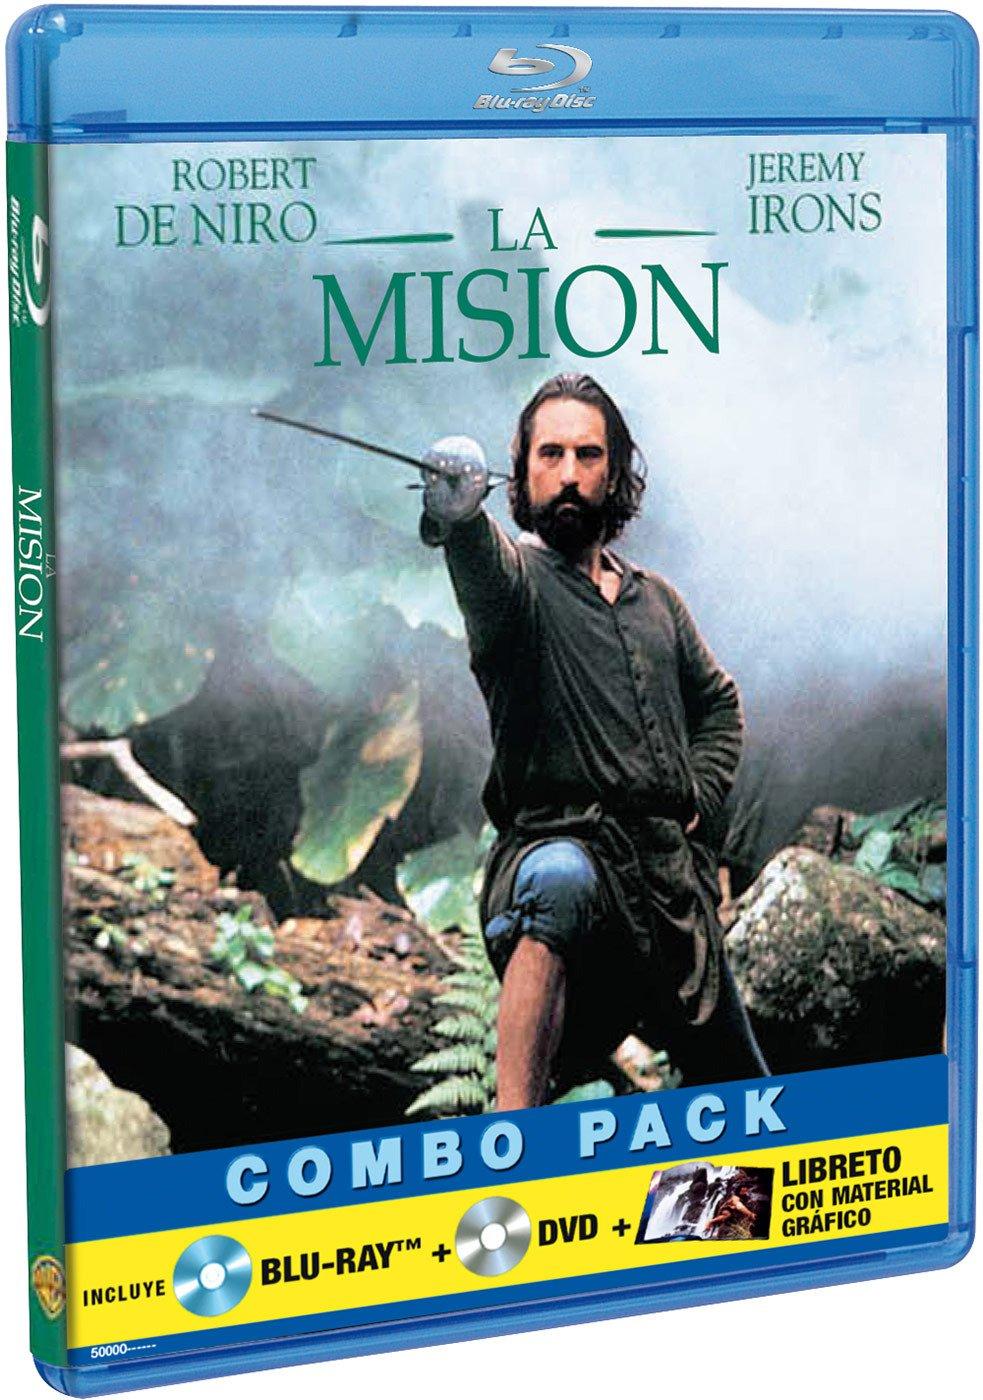 La Misión (BD + DVD) [Blu-ray]: Amazon.es: Robert De Niro, Jeremy Irons, Ray McAnally, Aidan Quinn, Cherie Lunghi, Ronald Pickup, Chuck Low, Liam Neeson, Bercelio Moya, Roland Joffé, Robert De Niro, Jeremy